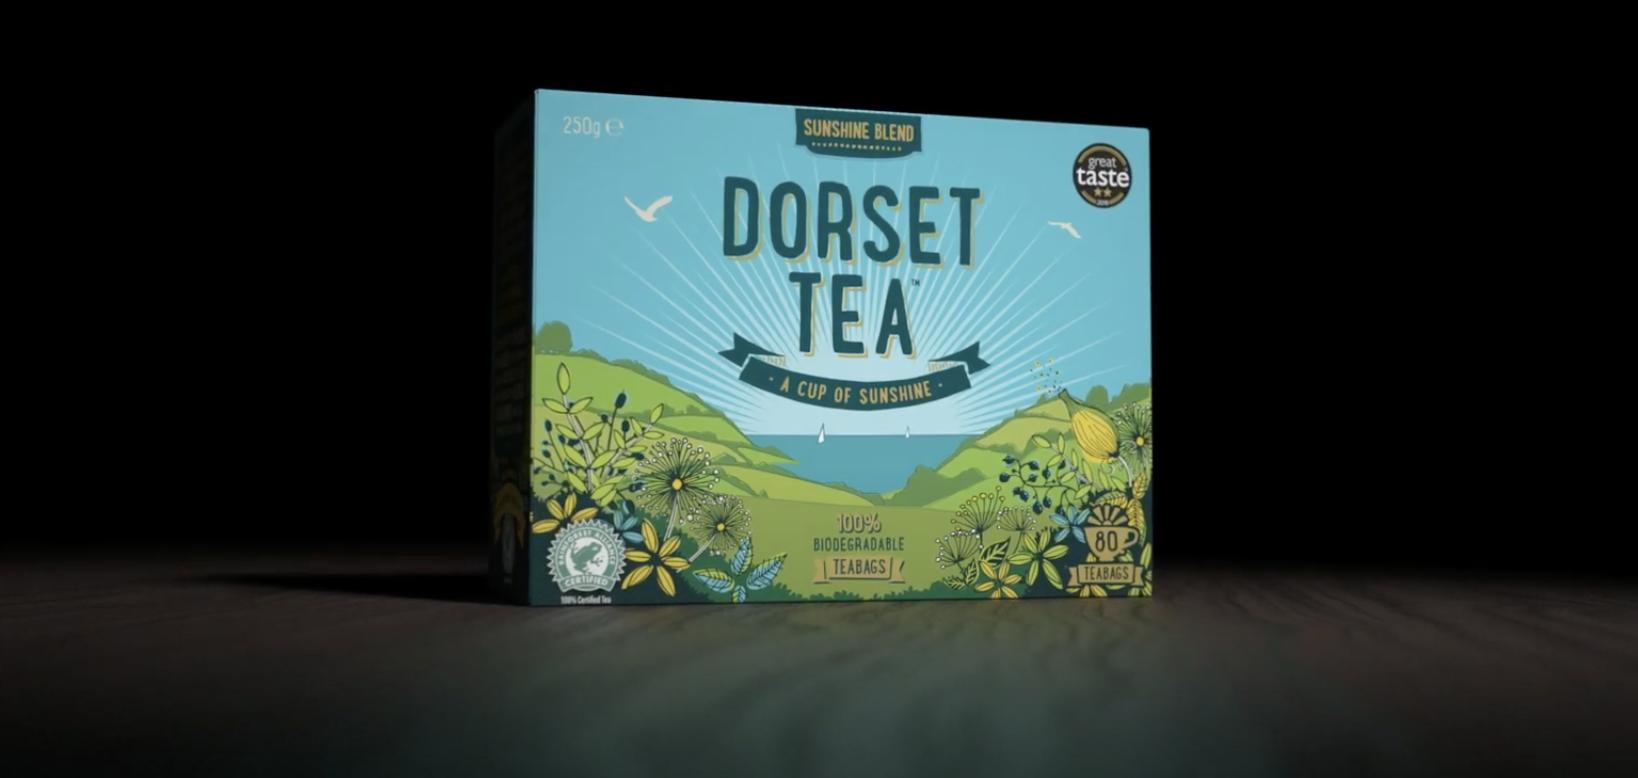 Dorset Tea biodegradable teabags